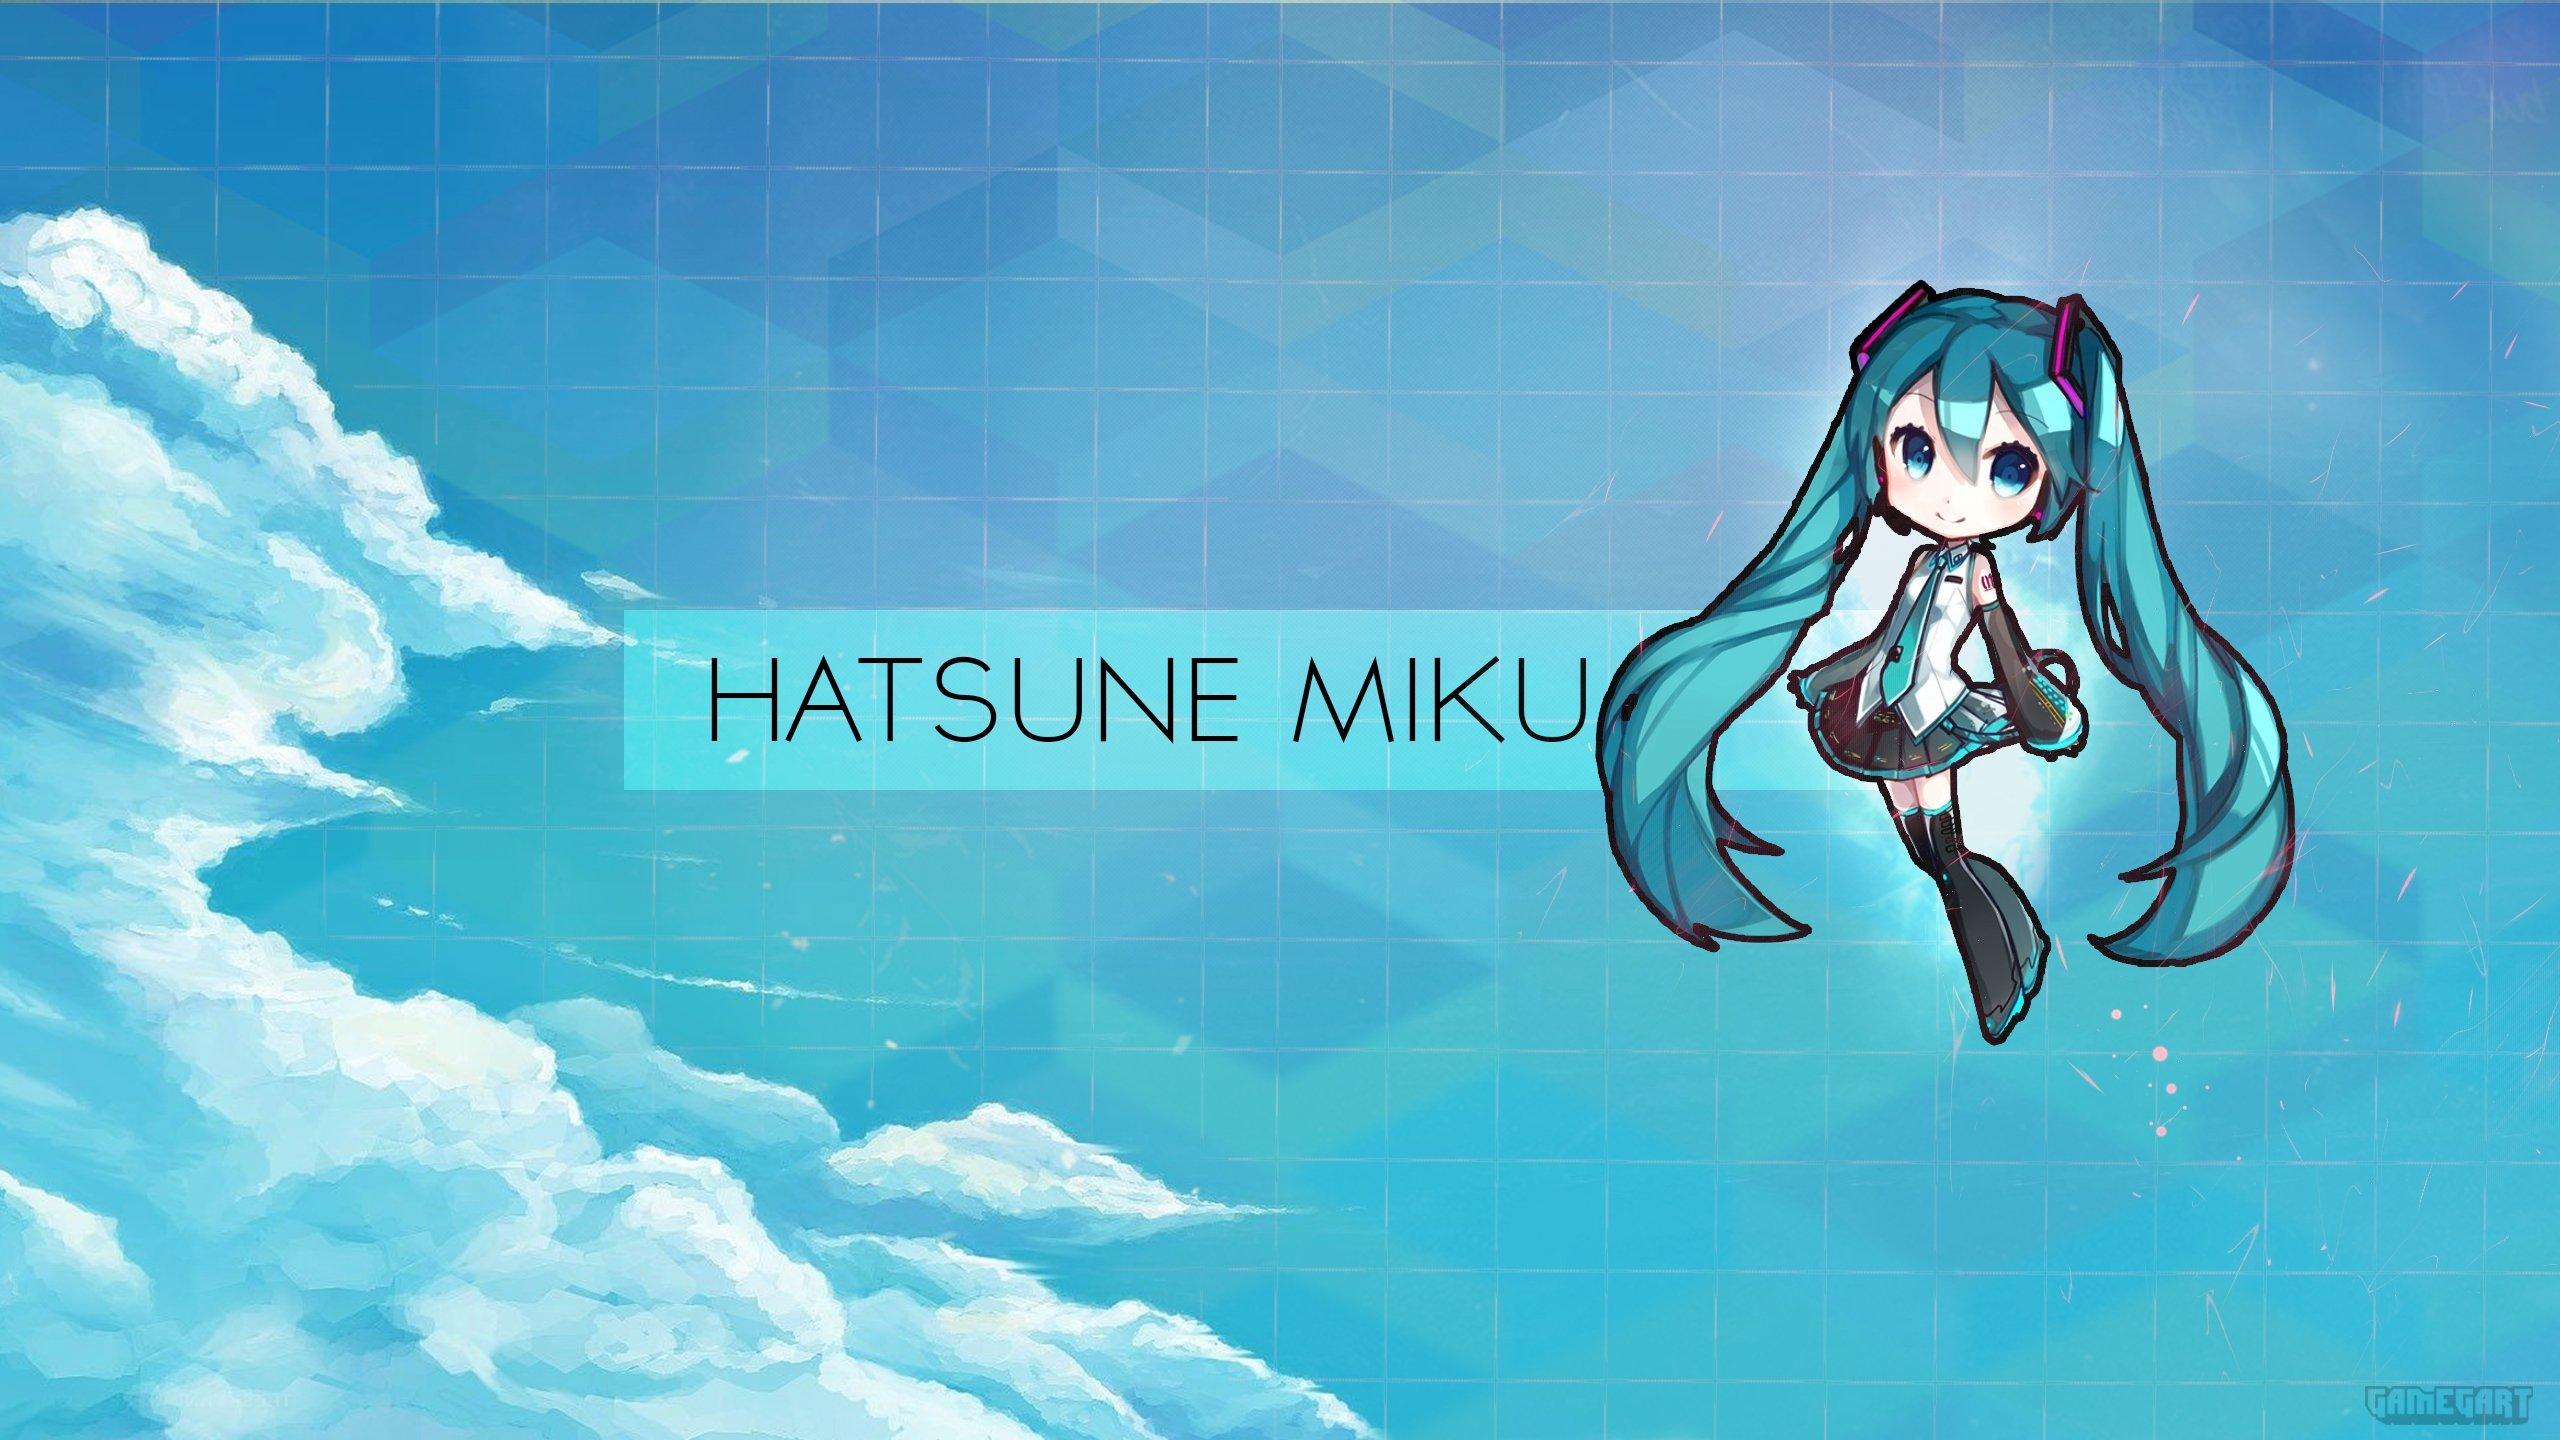 Fondos de pantalla Hatsune Miku